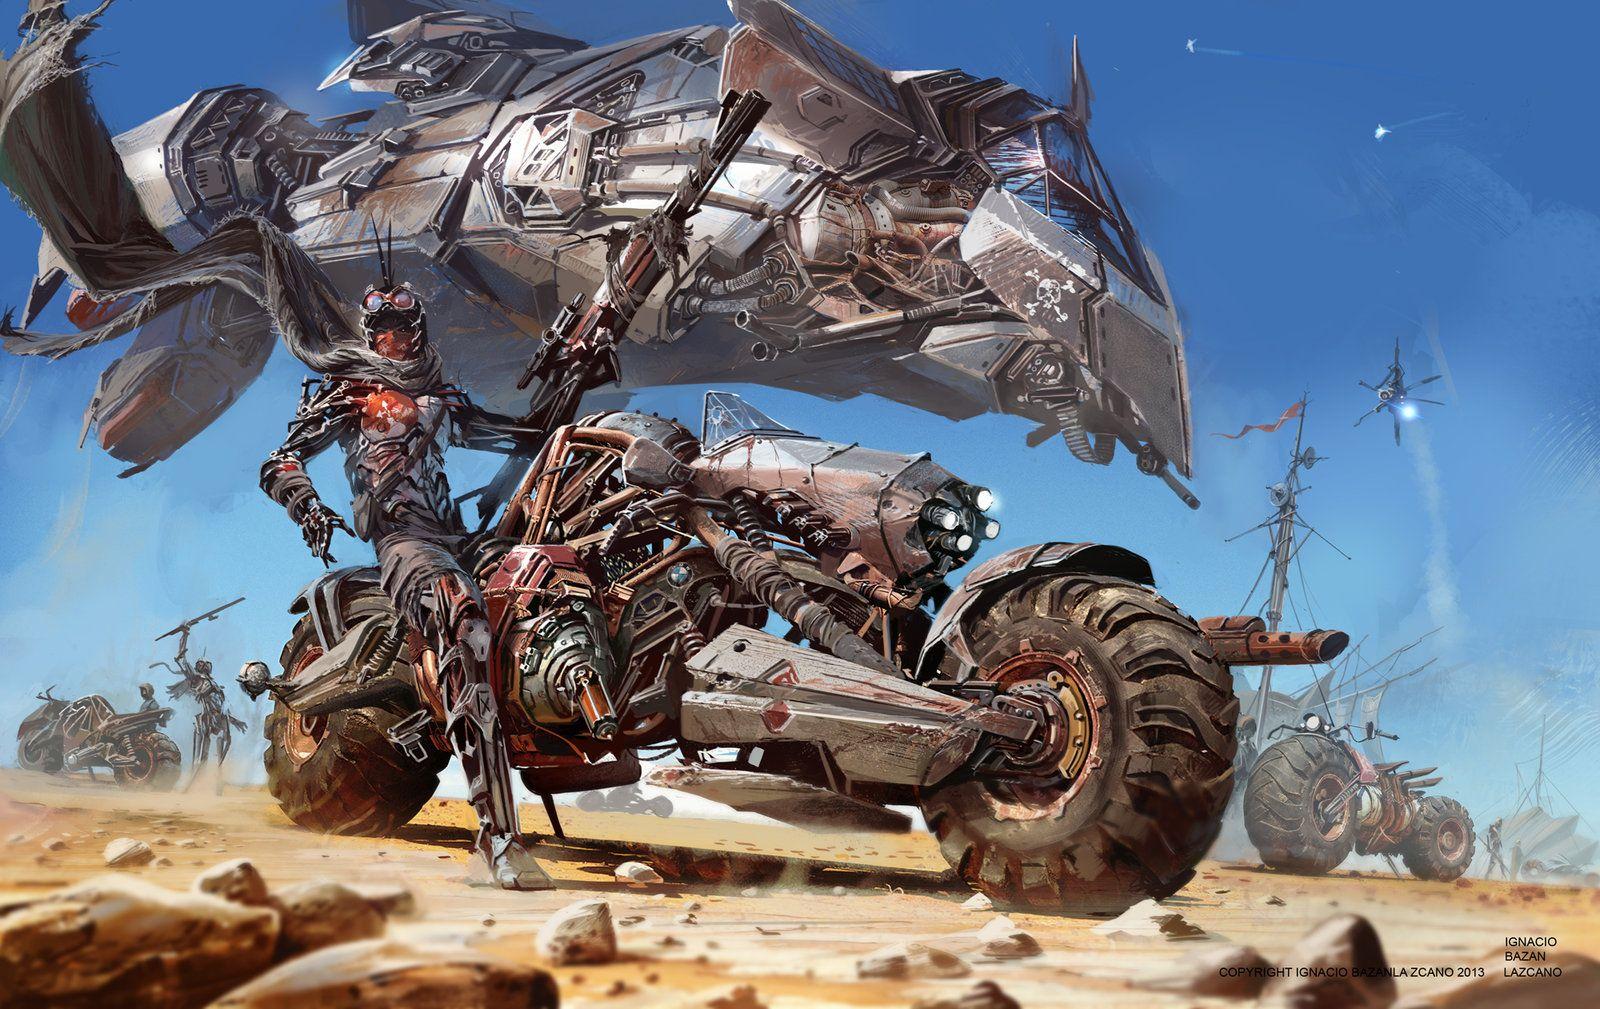 Desert bike revel camp  Ignacio Bazan Lazcano http://neisbeis.artstation.com/ http://neisbeis.deviantart.com/  #Ignaciobazanlazcano #thebrushtool #digitalart #cg